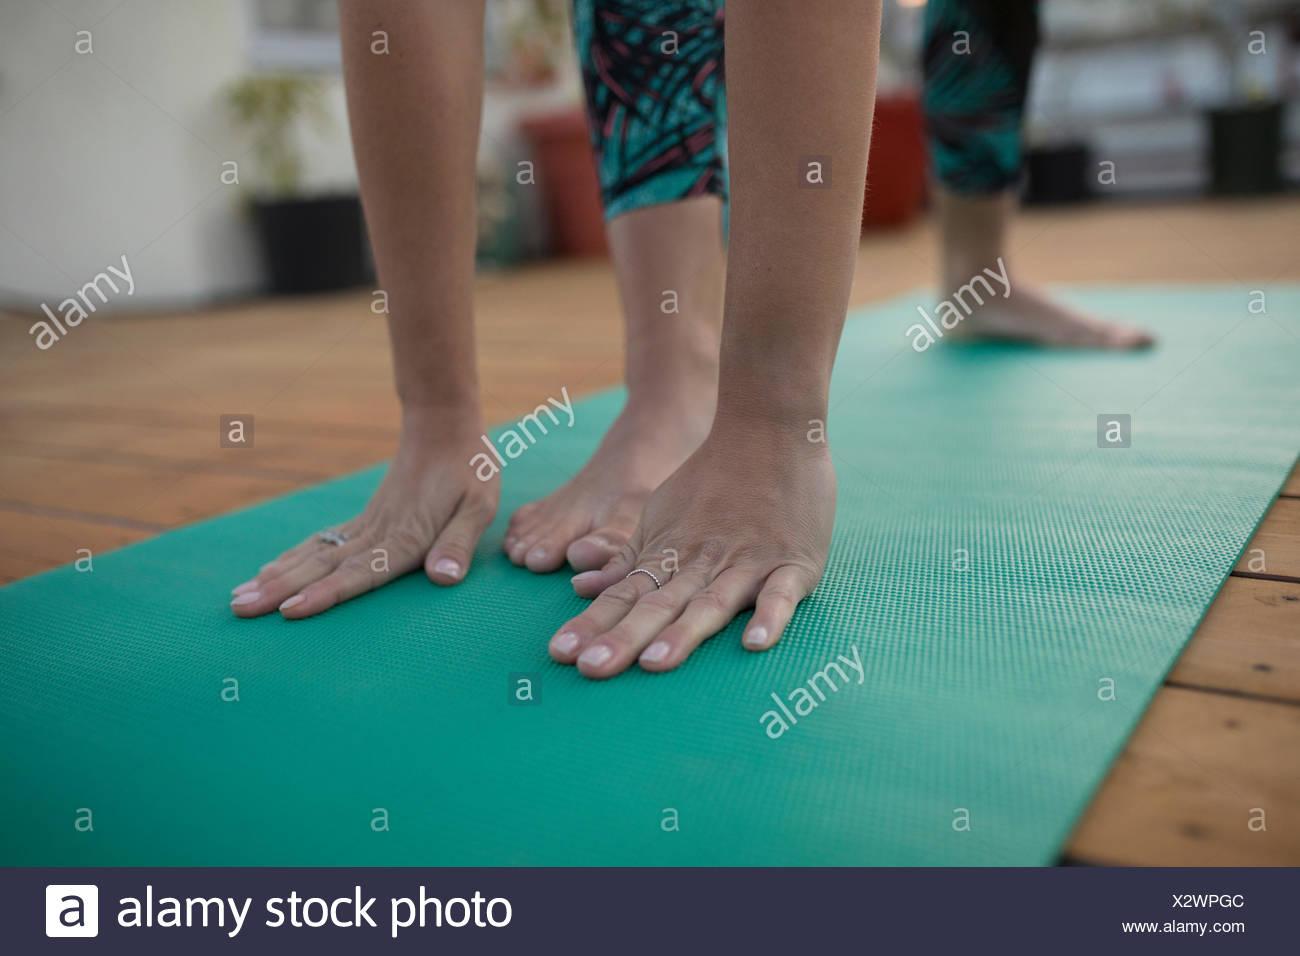 Close up woman practicing yoga on yoga mat avec pied entre les mains Photo Stock